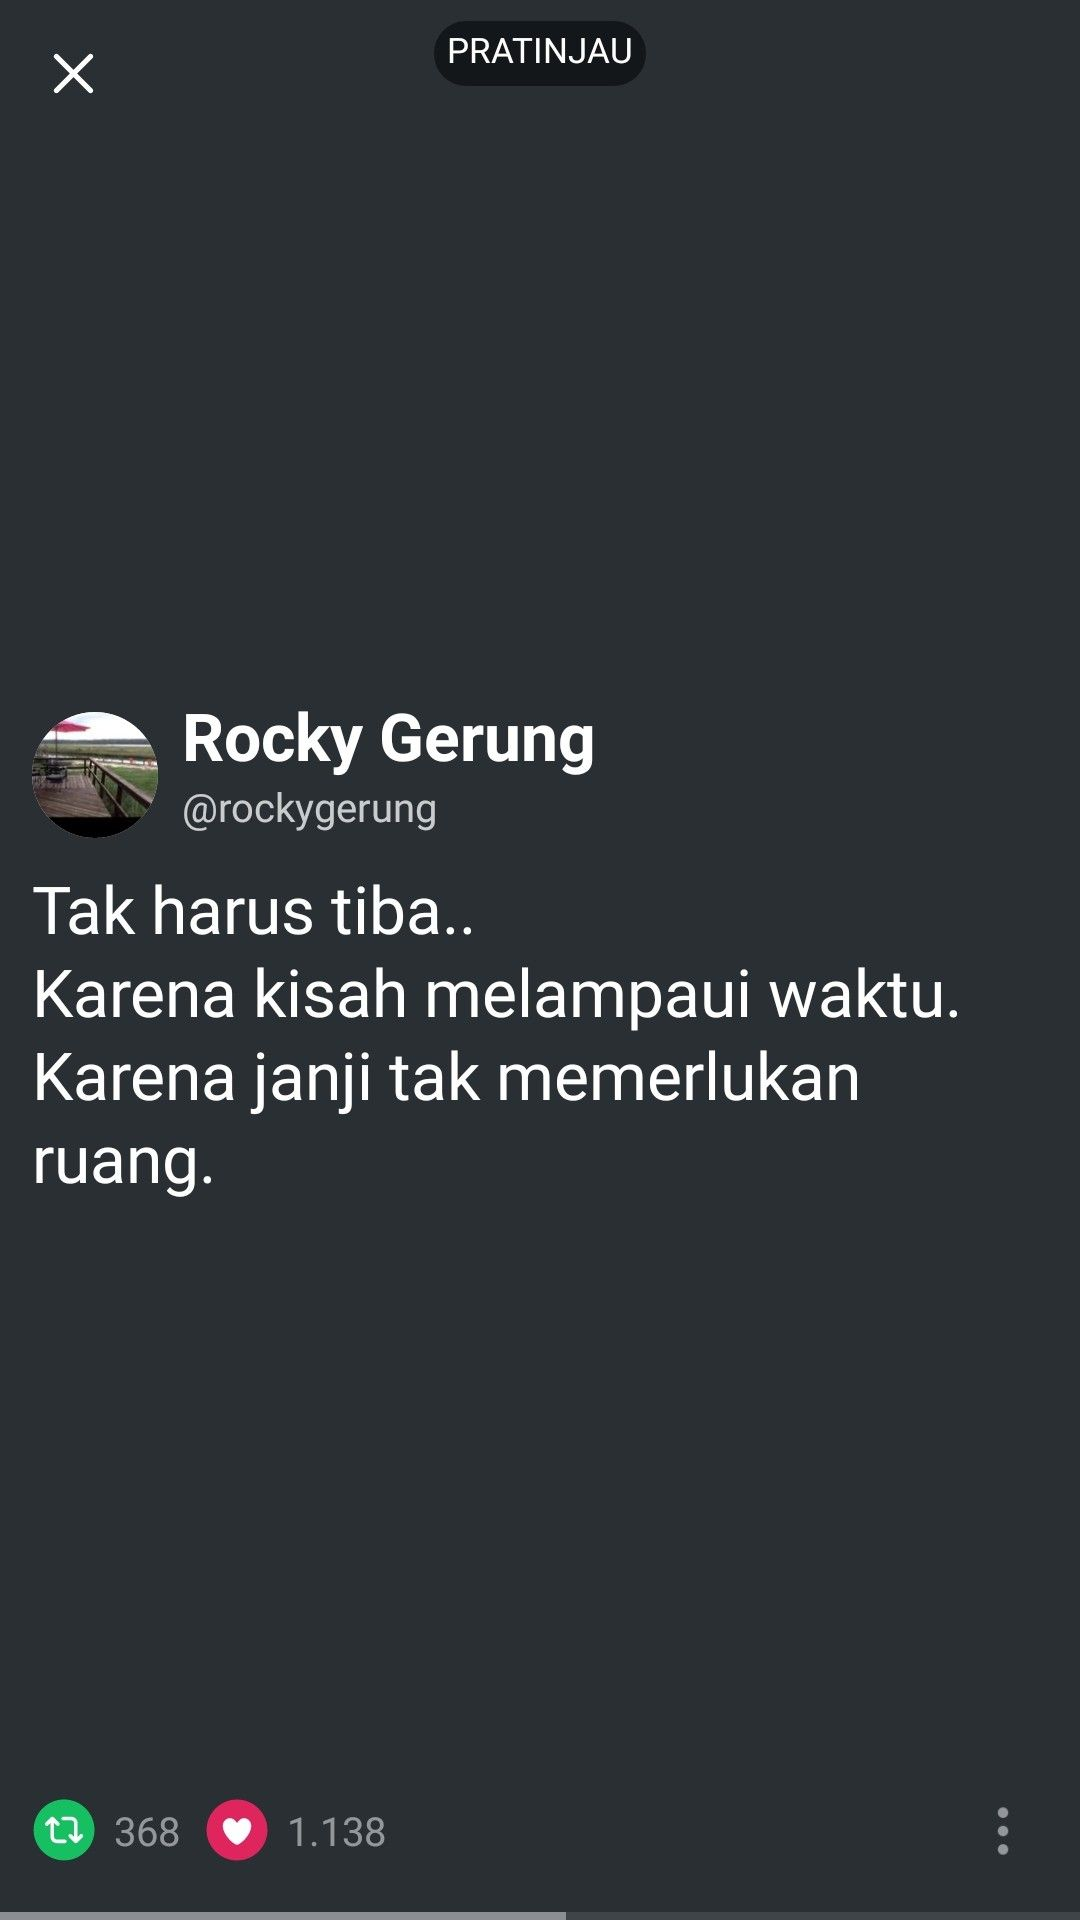 Rocky Gerung Kutipan Hidup Kutipan Tentang Cinta Kutipan Motivasi